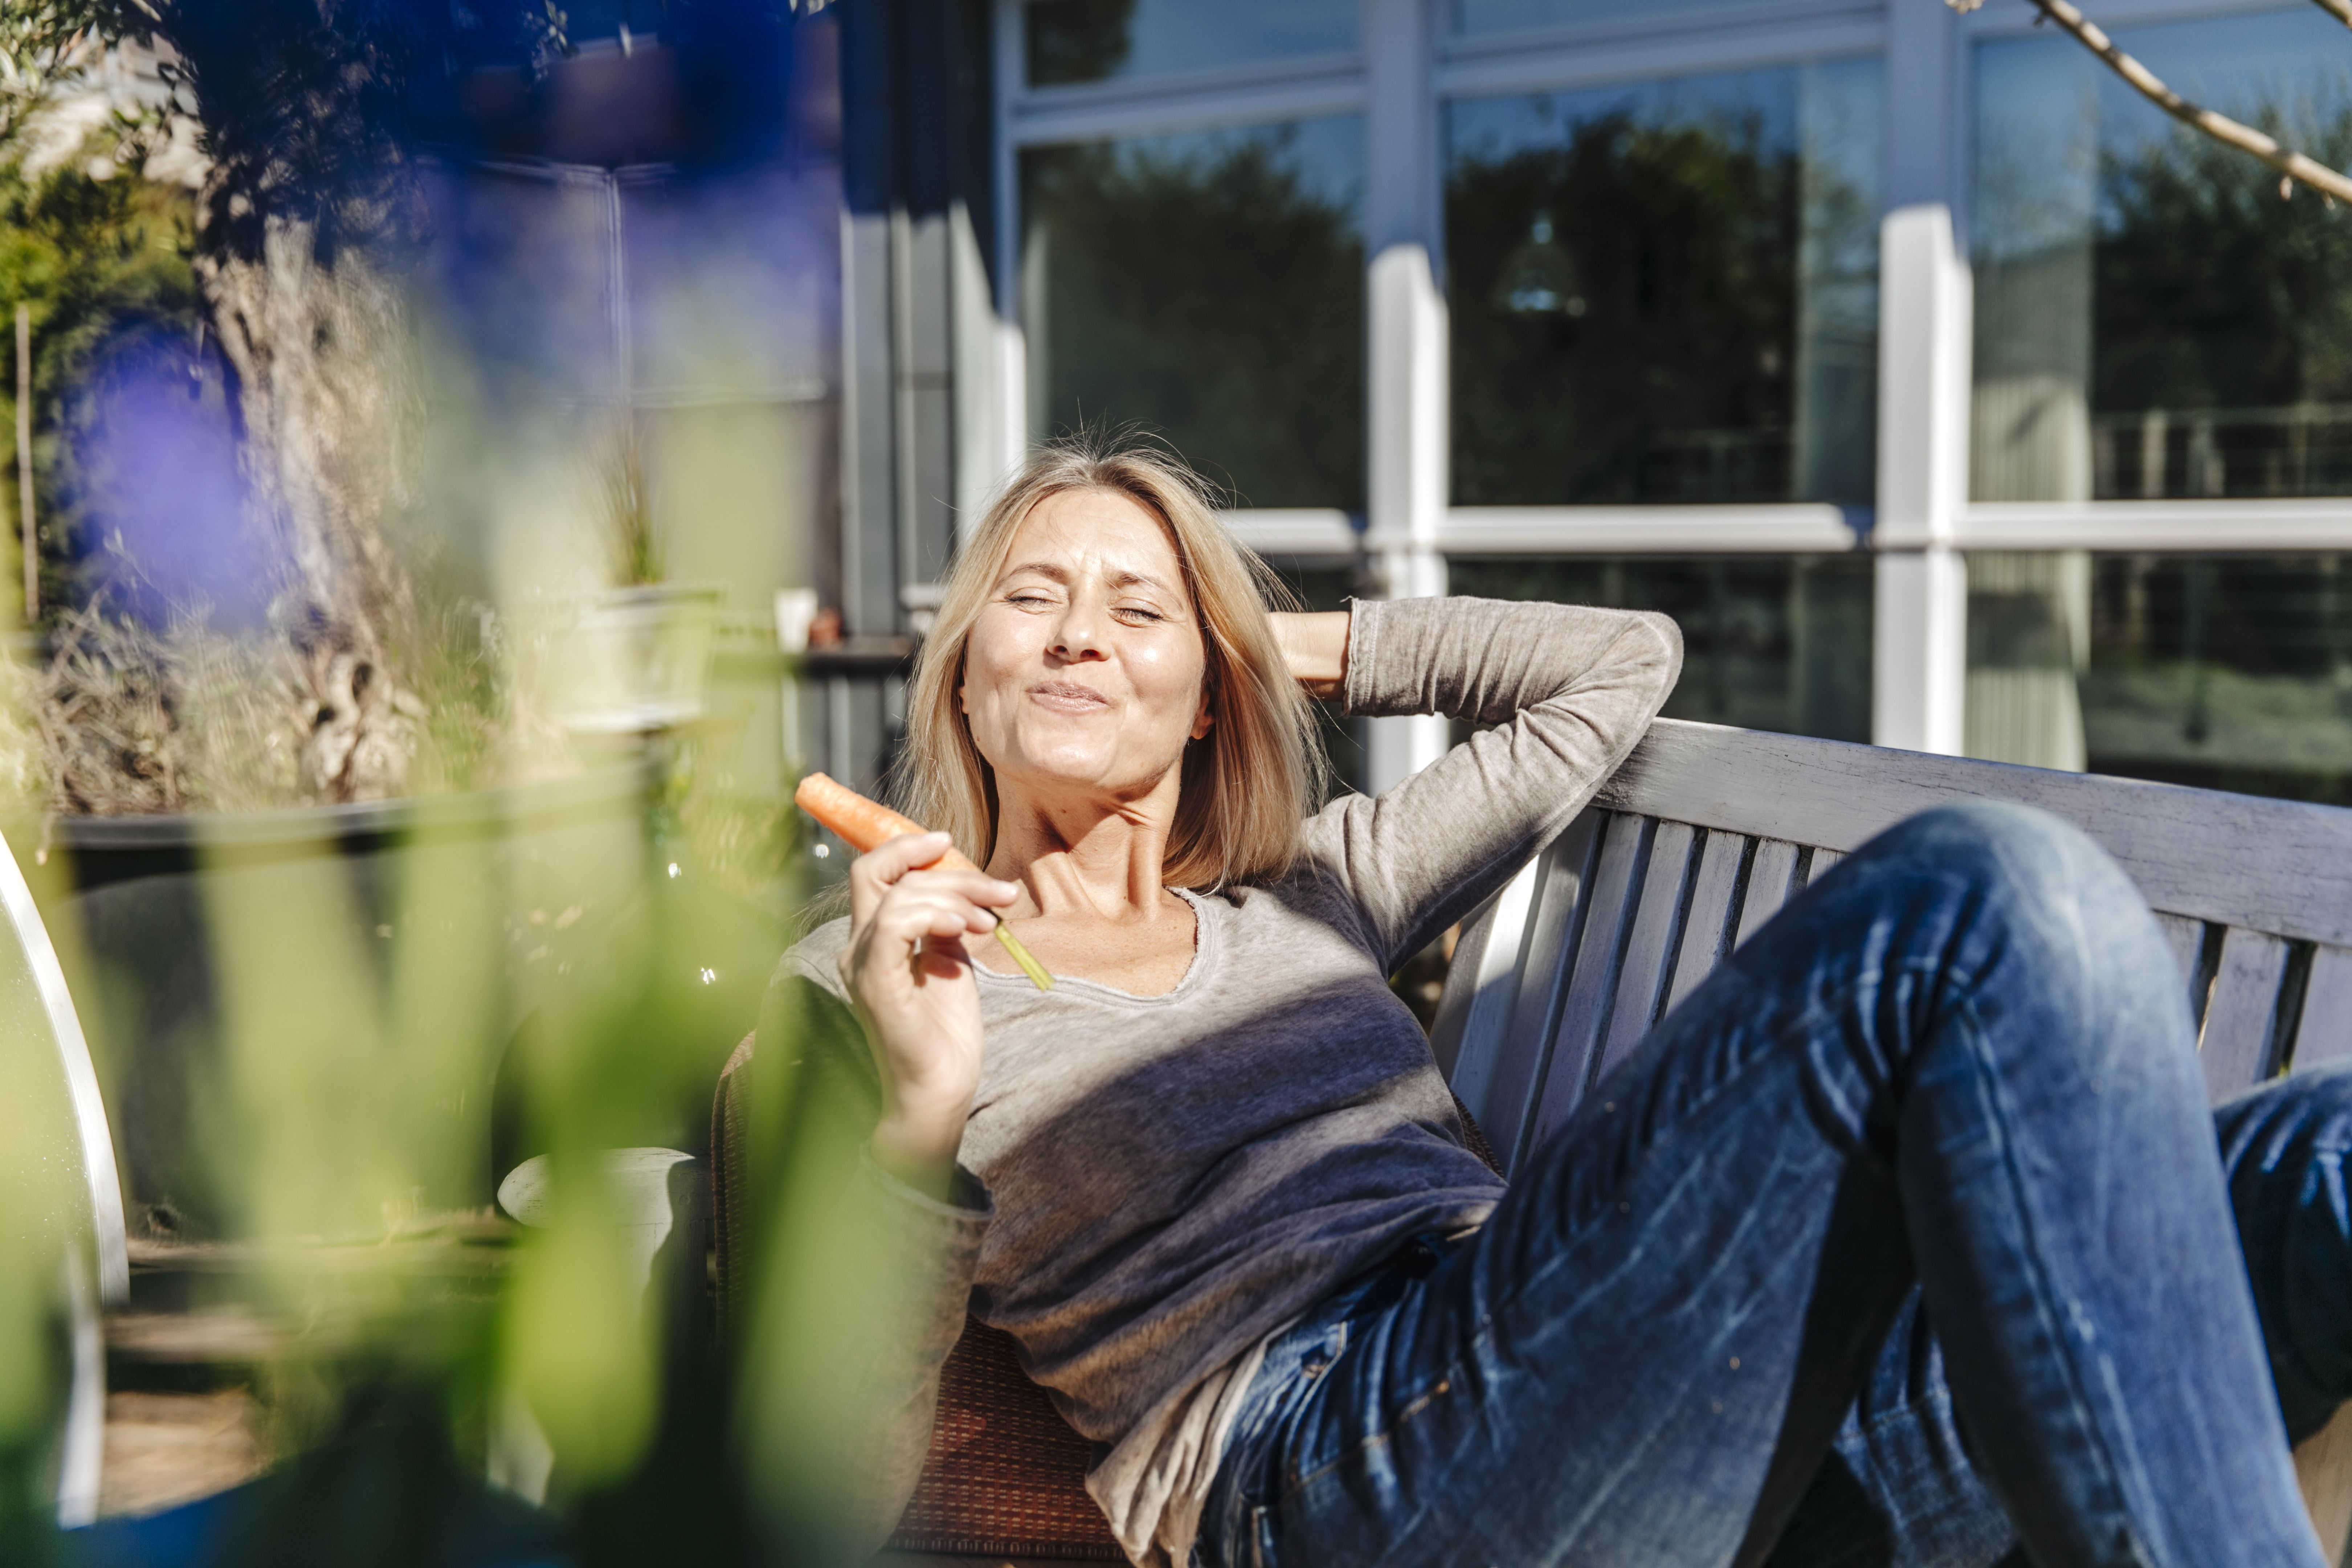 Woman relaxing on garden bench eating a carrot